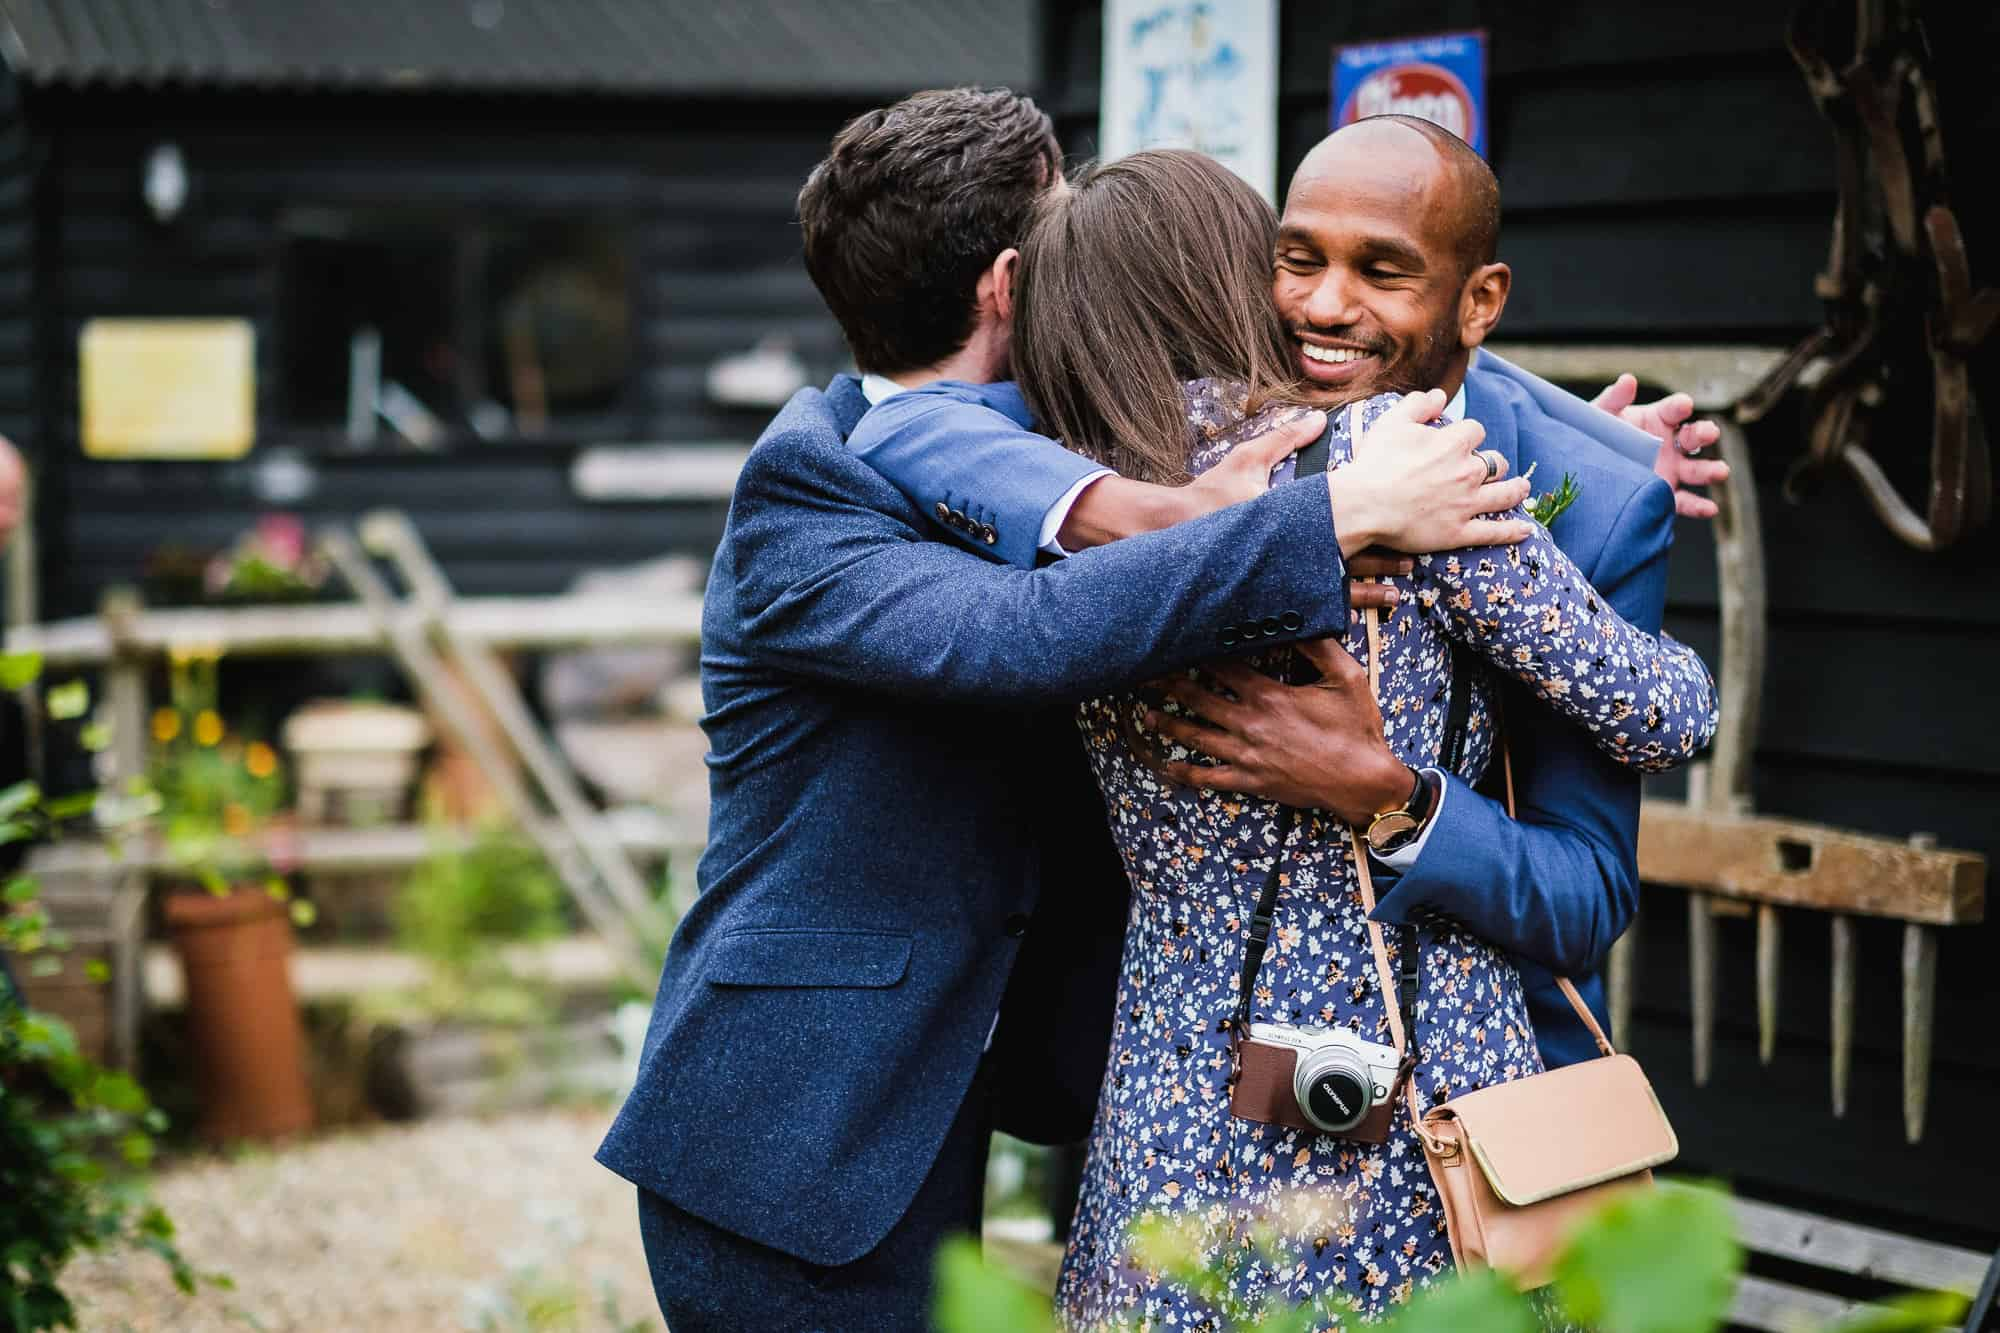 marleybrook-house-wedding-photography-matt-tyler-0015